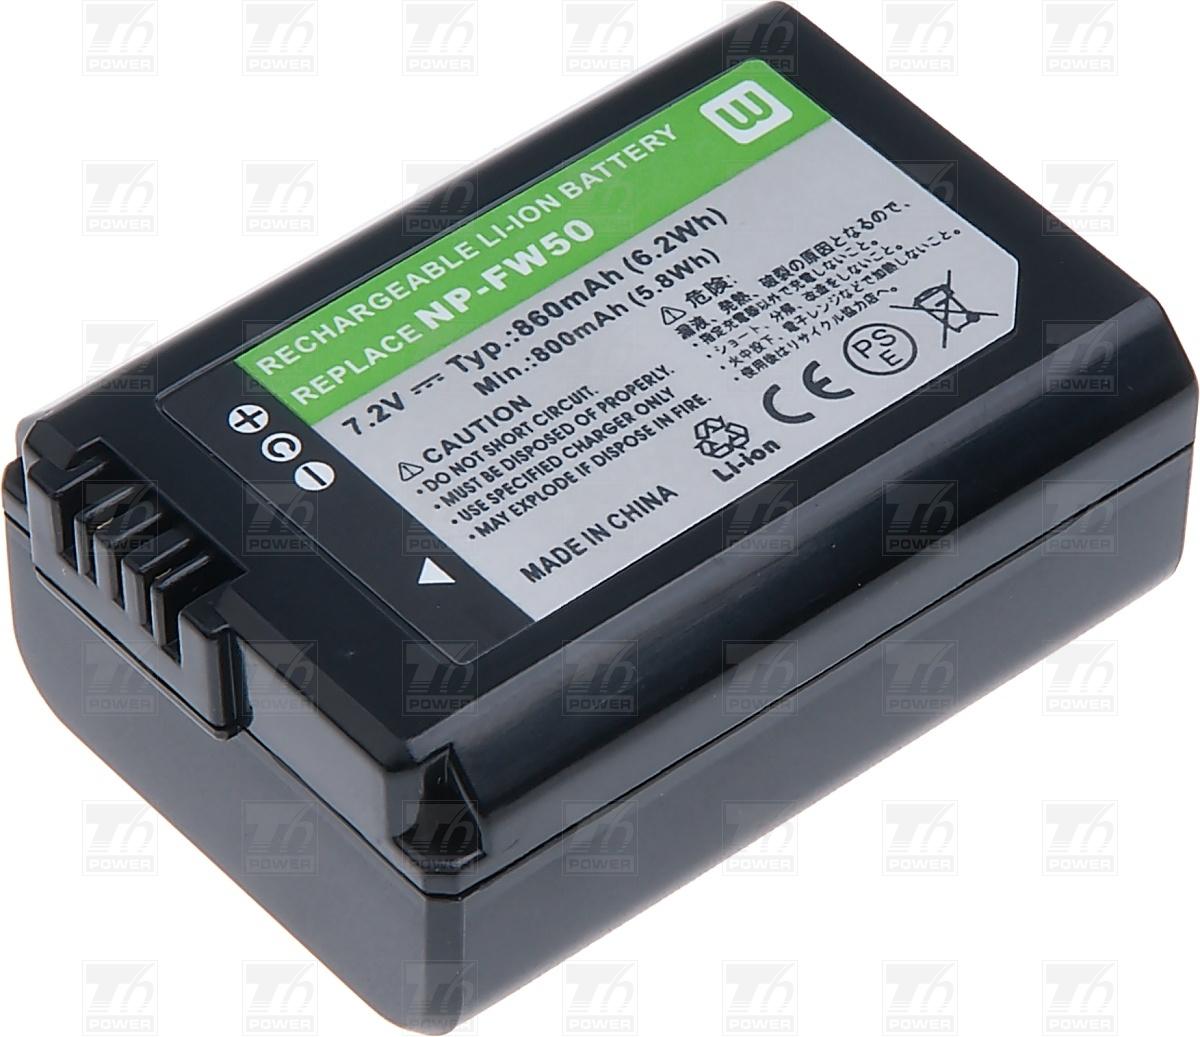 T6 power Baterie T6 power NP-FW50 DCSO0026